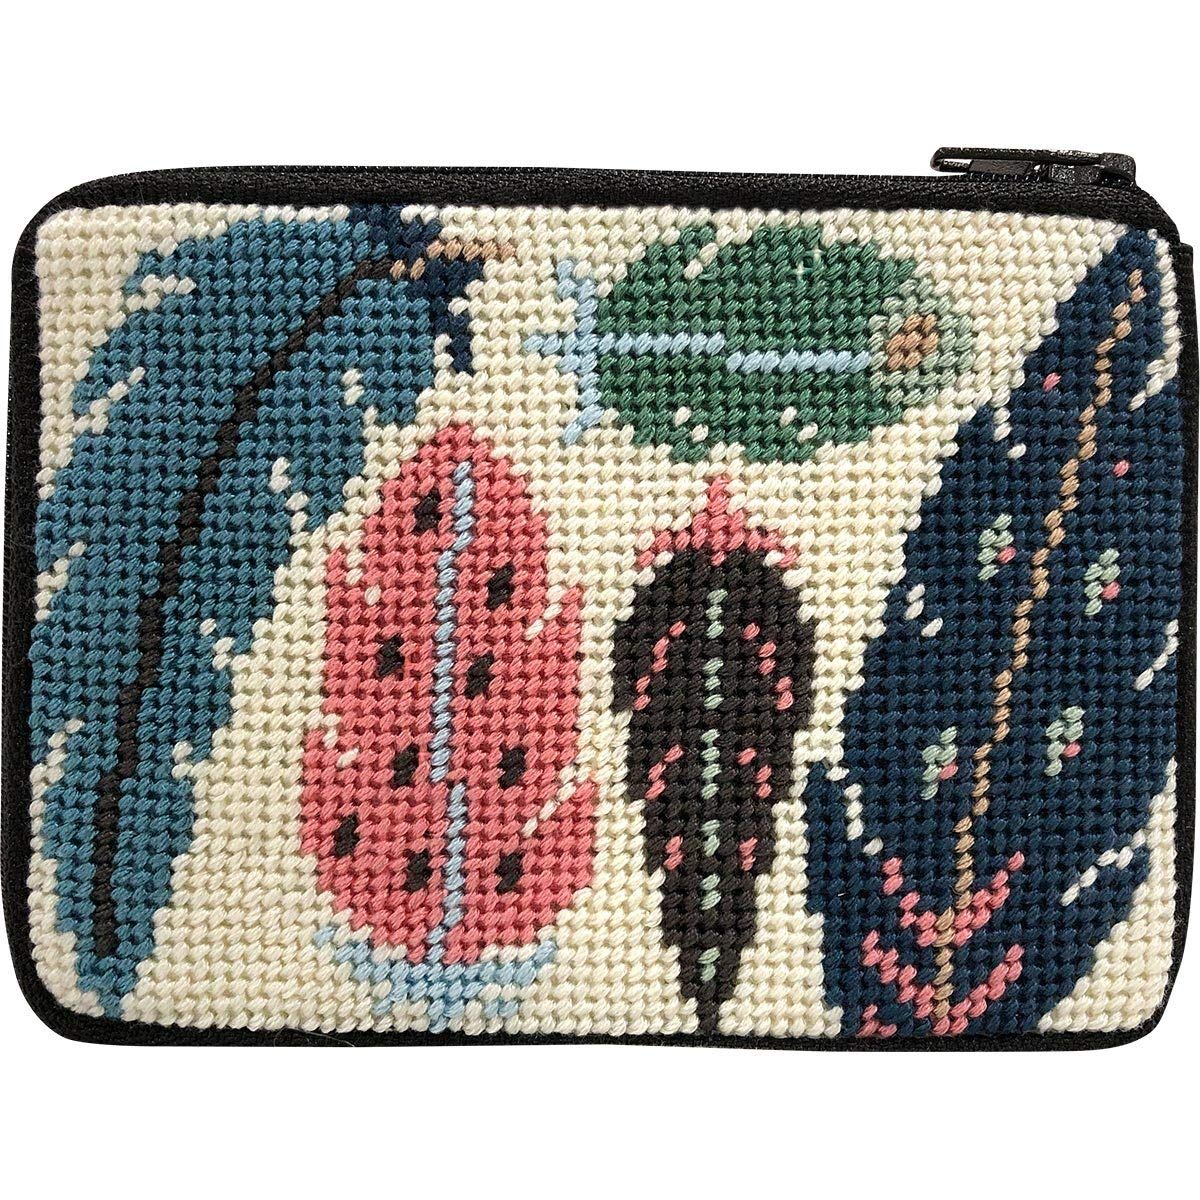 Stitch /& Zip Needlepoint Coin Purse Kit Feathers